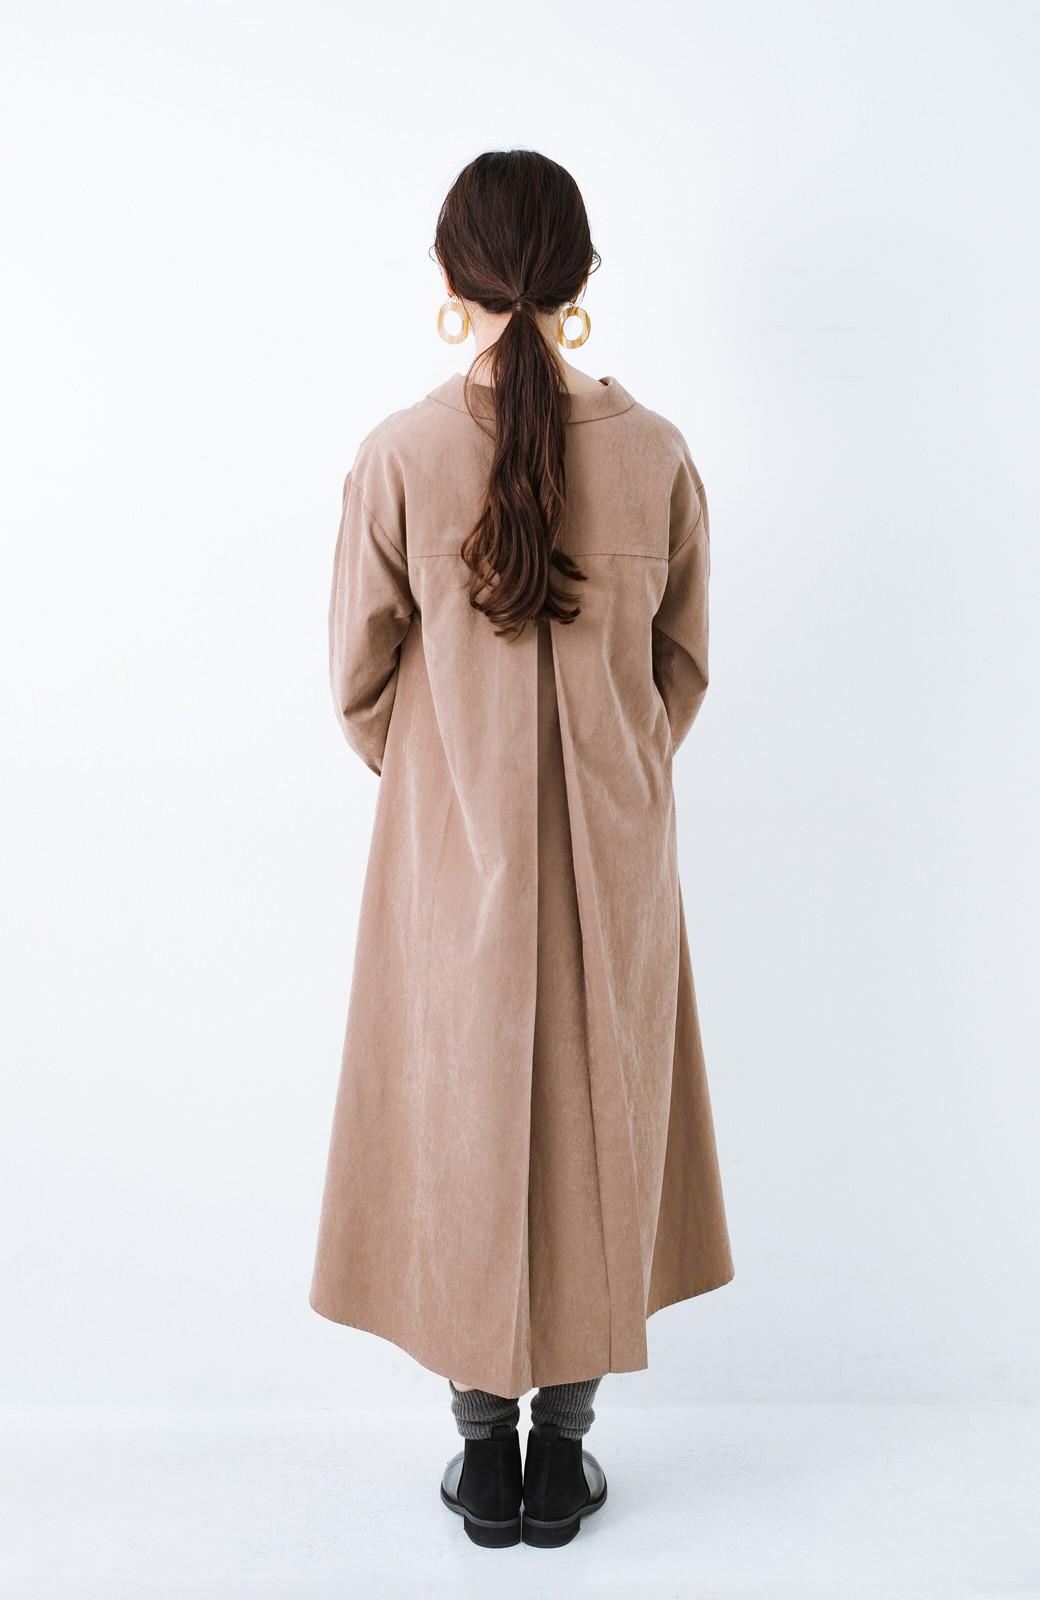 haco! 太ってもばれずに羽織っても便利なAラインワンピース <ブラウン>の商品写真18